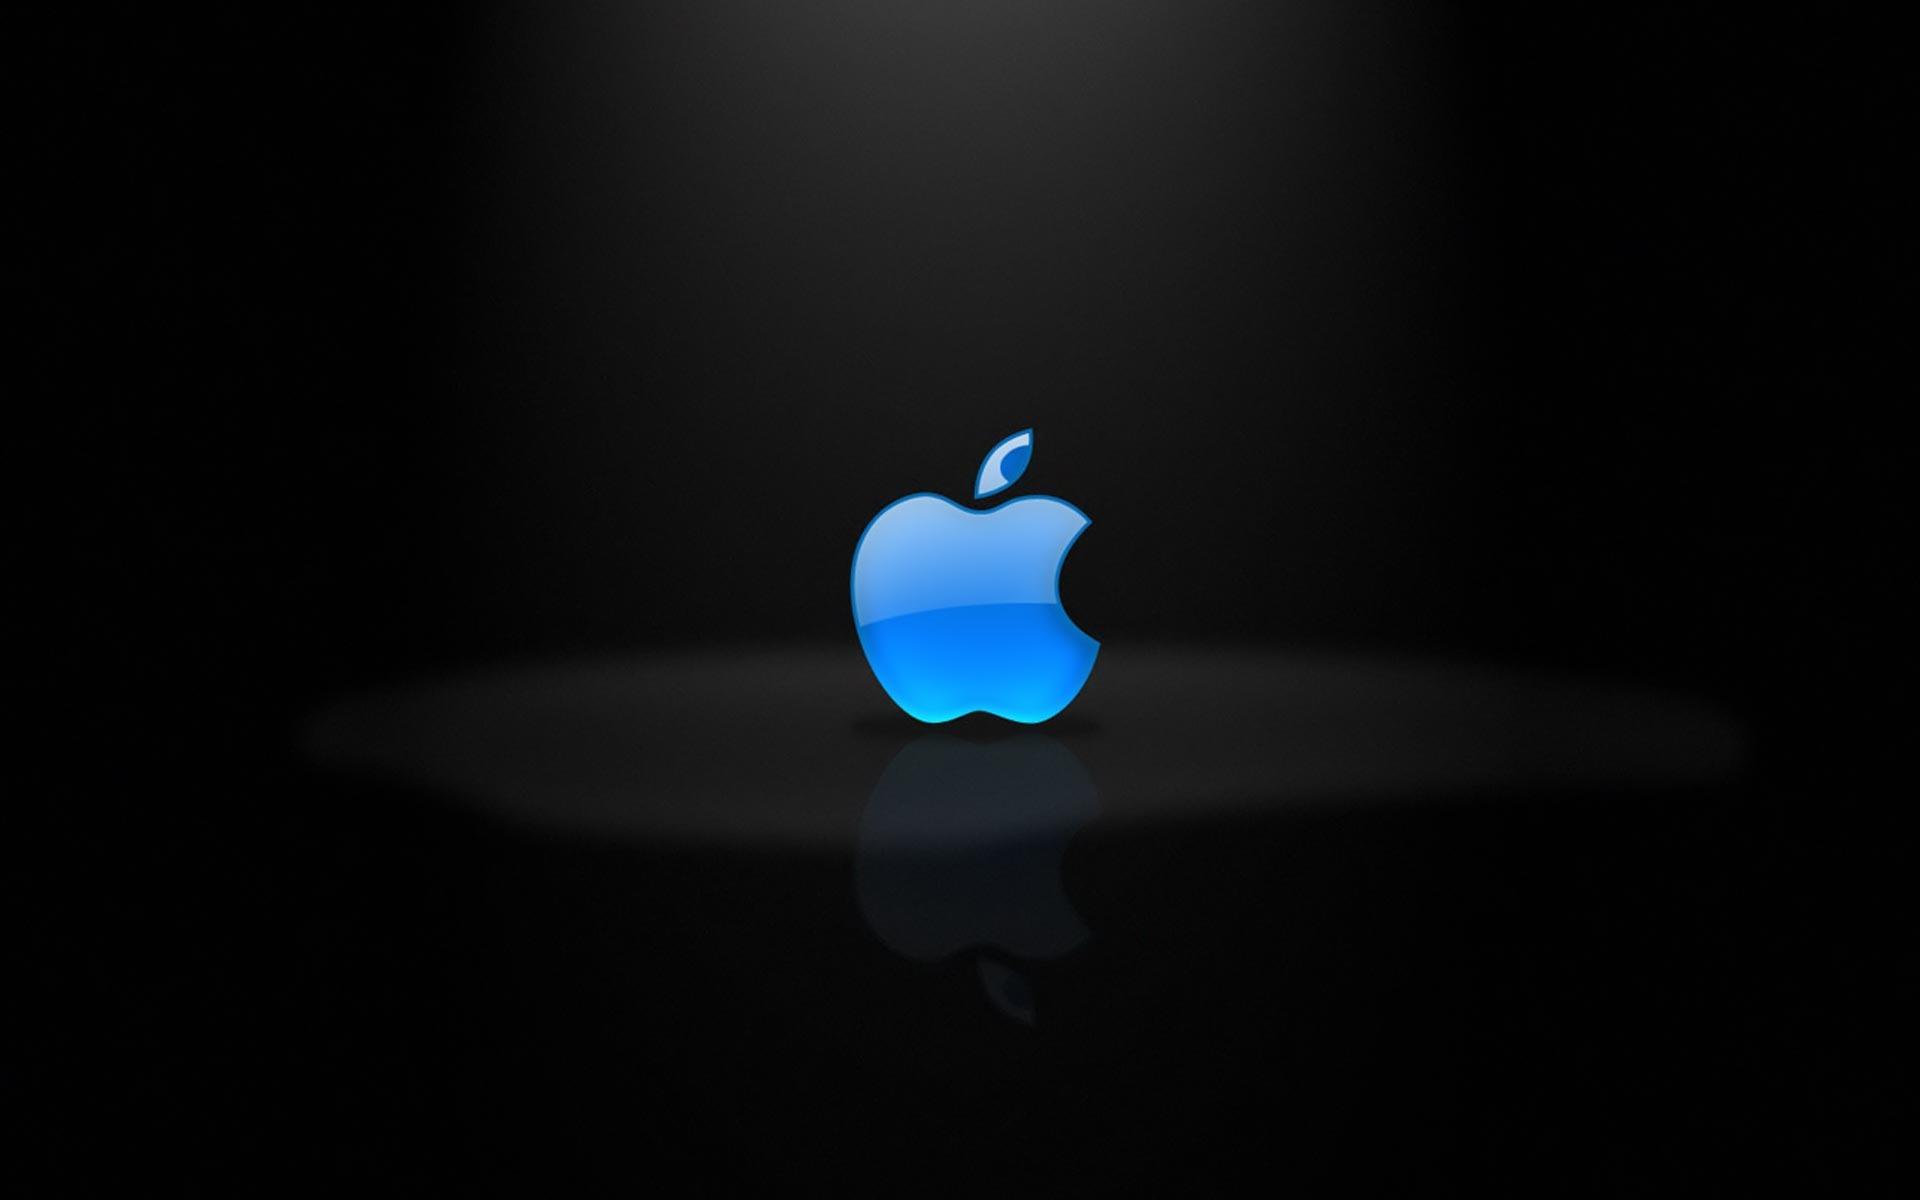 Blue Apple logo wallpaper 522 1920x1200